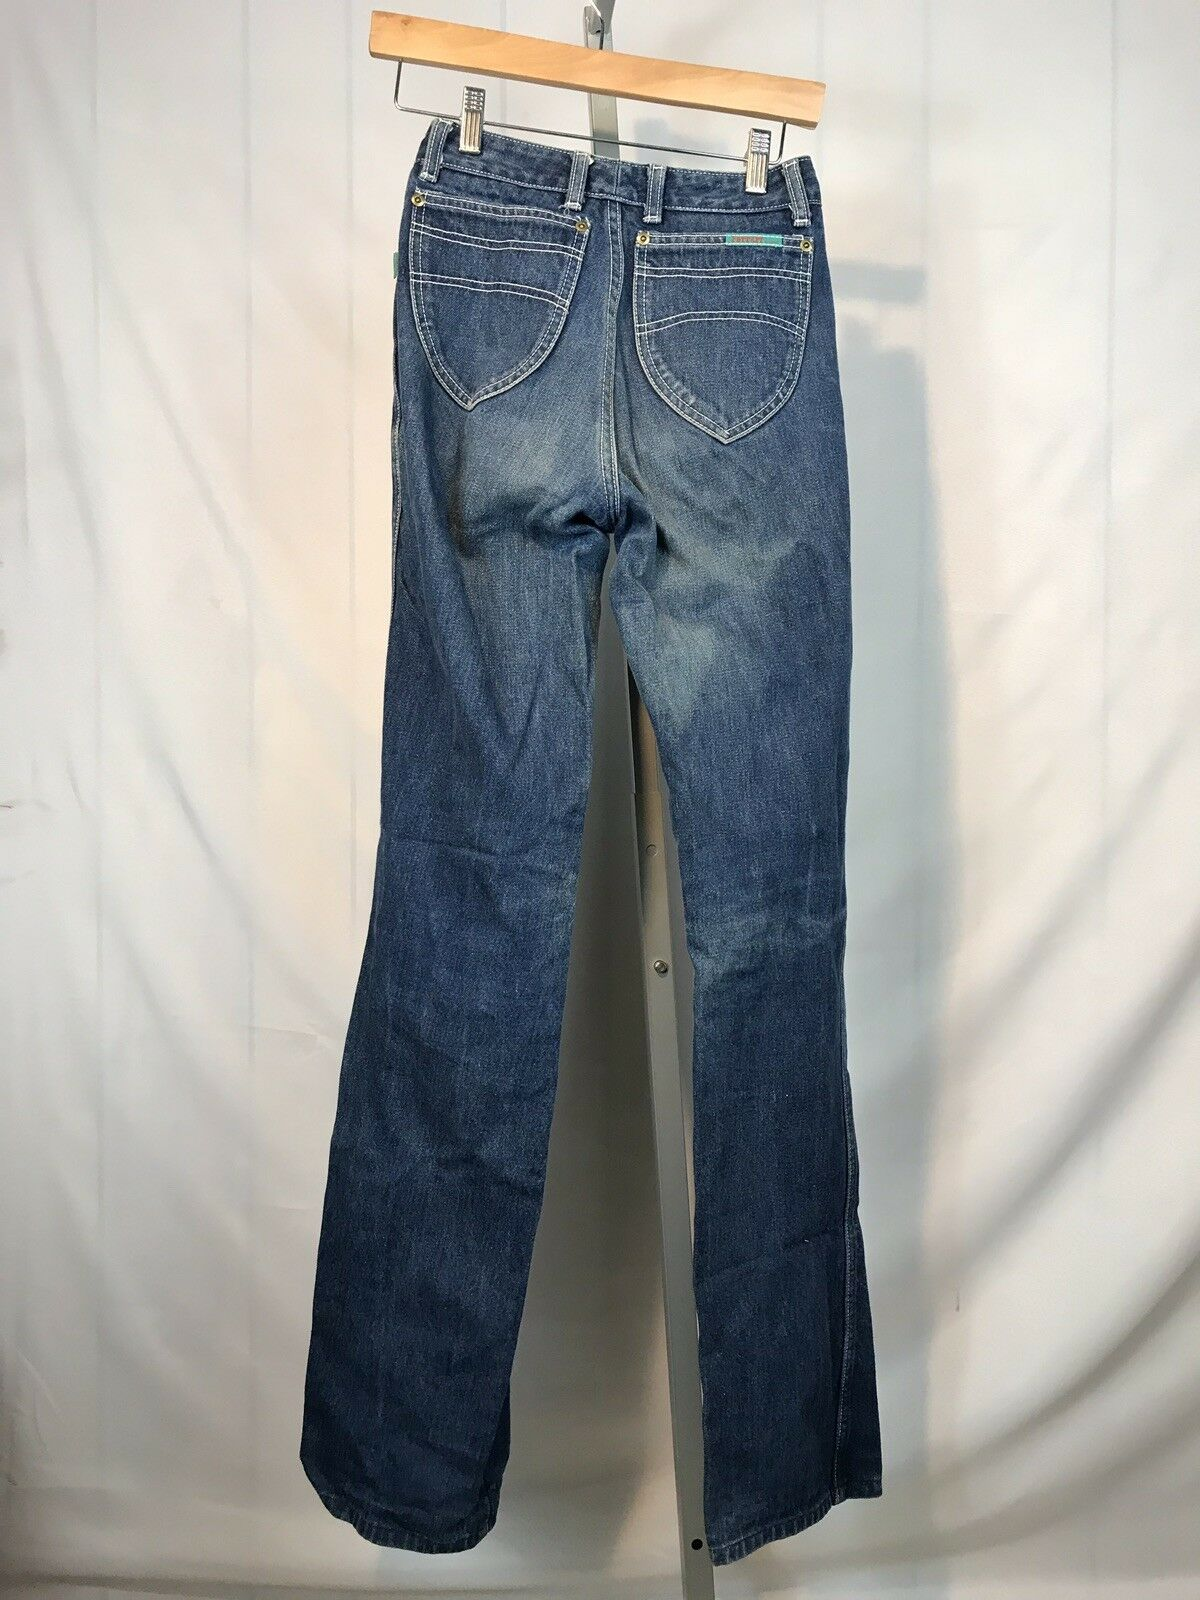 "Ferrari Women's Jeans 24"" Waist 33"" Inseam Size 36 Free US Shipping (AP)"